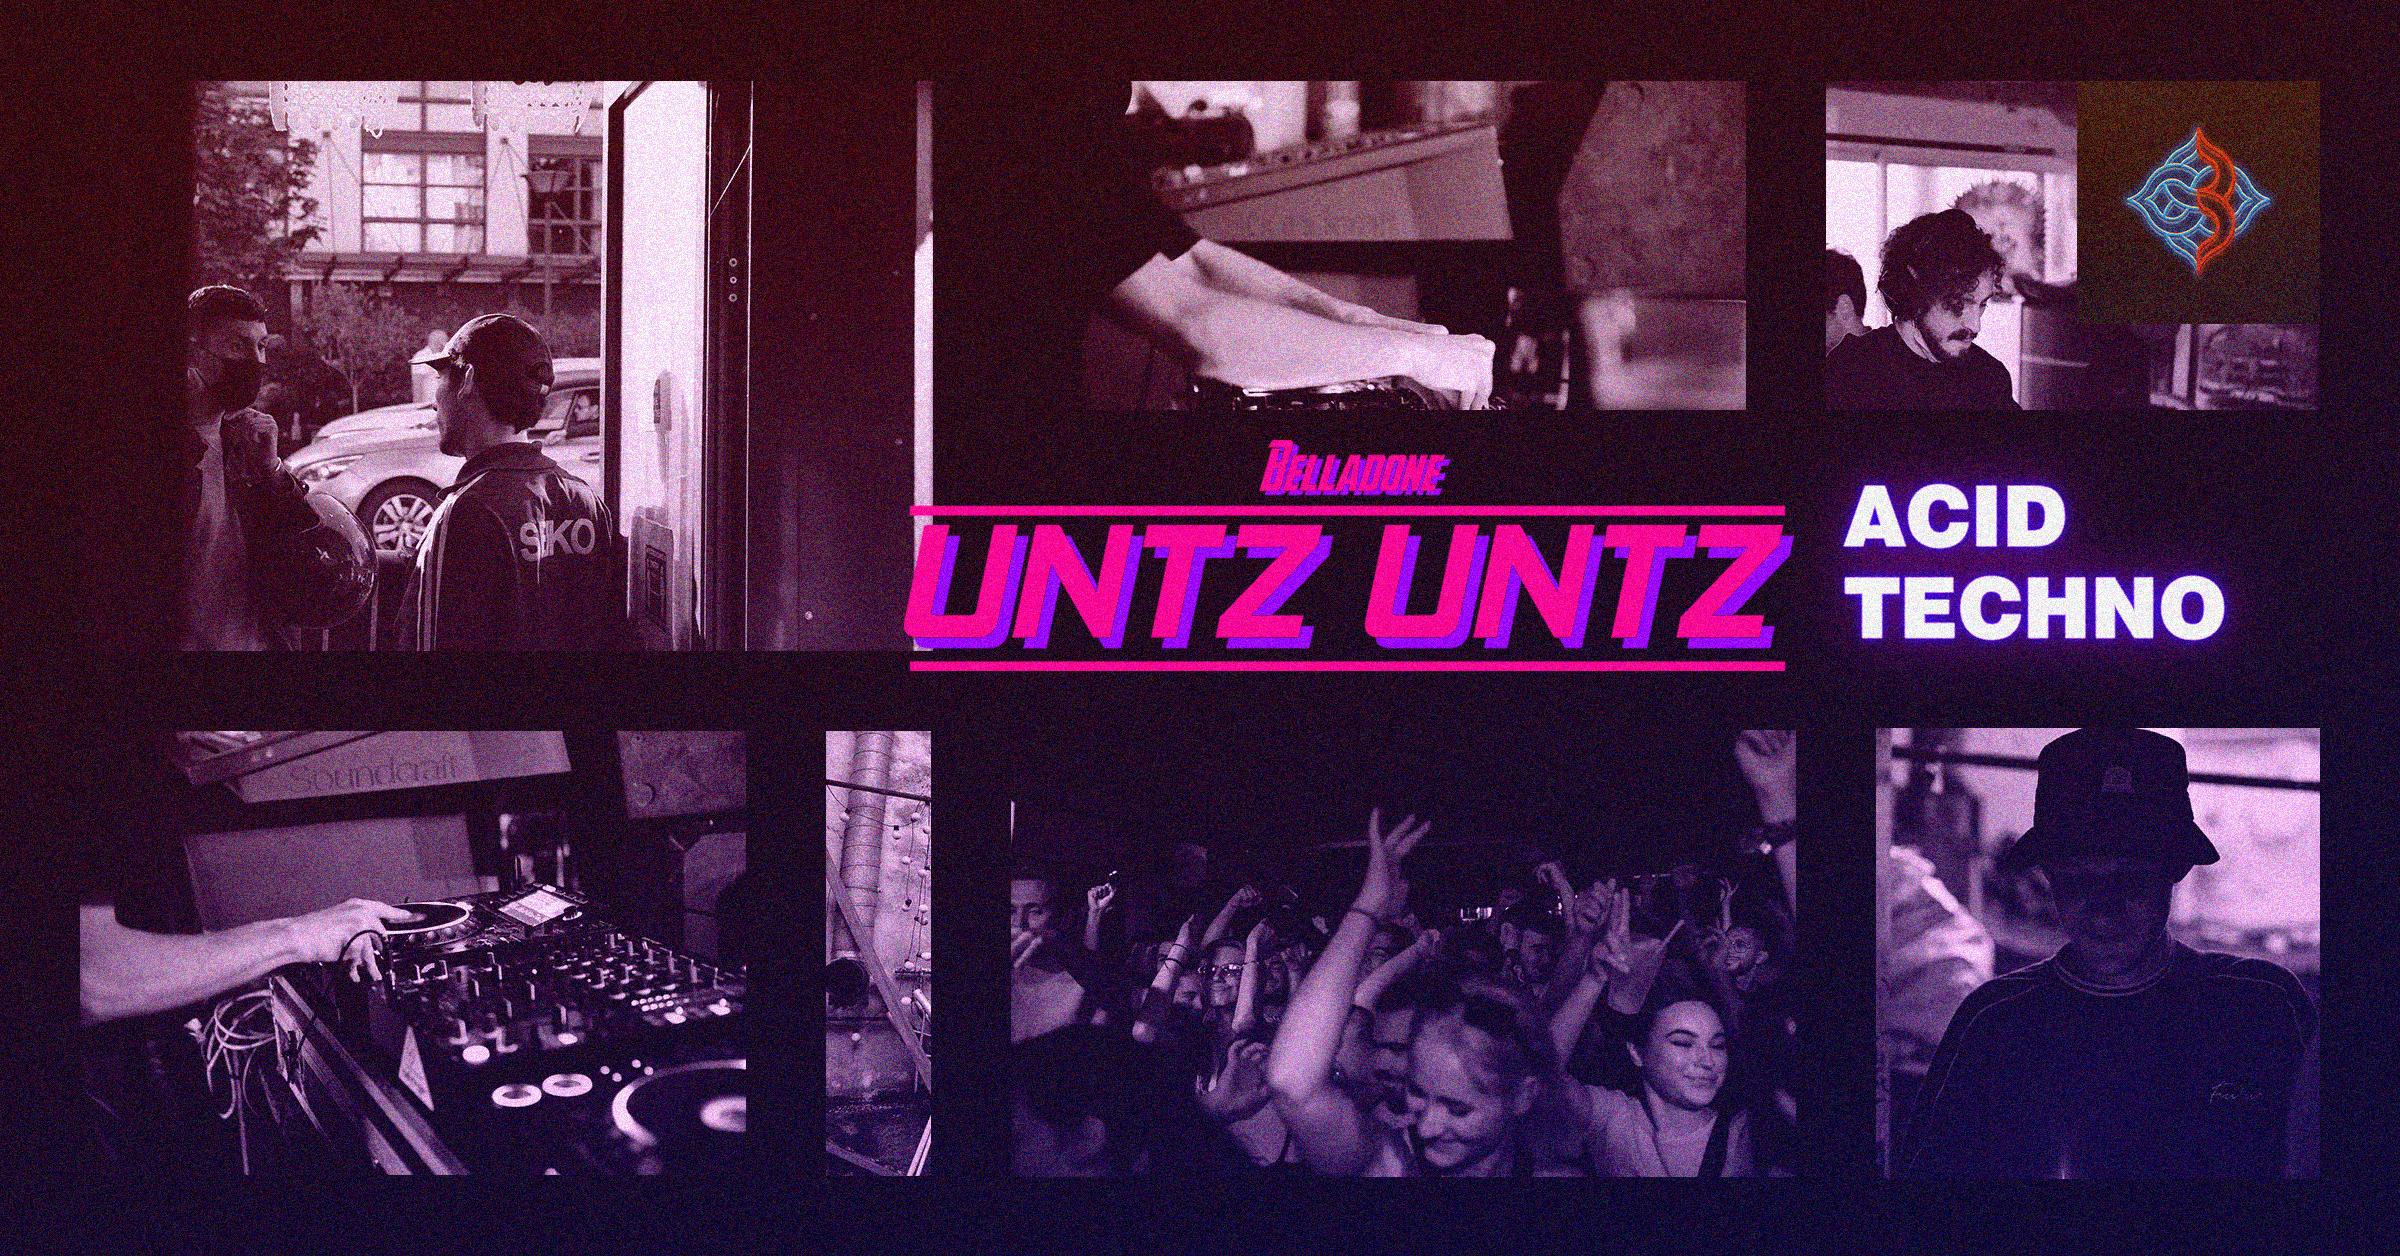 untz untz - Techno & Acid